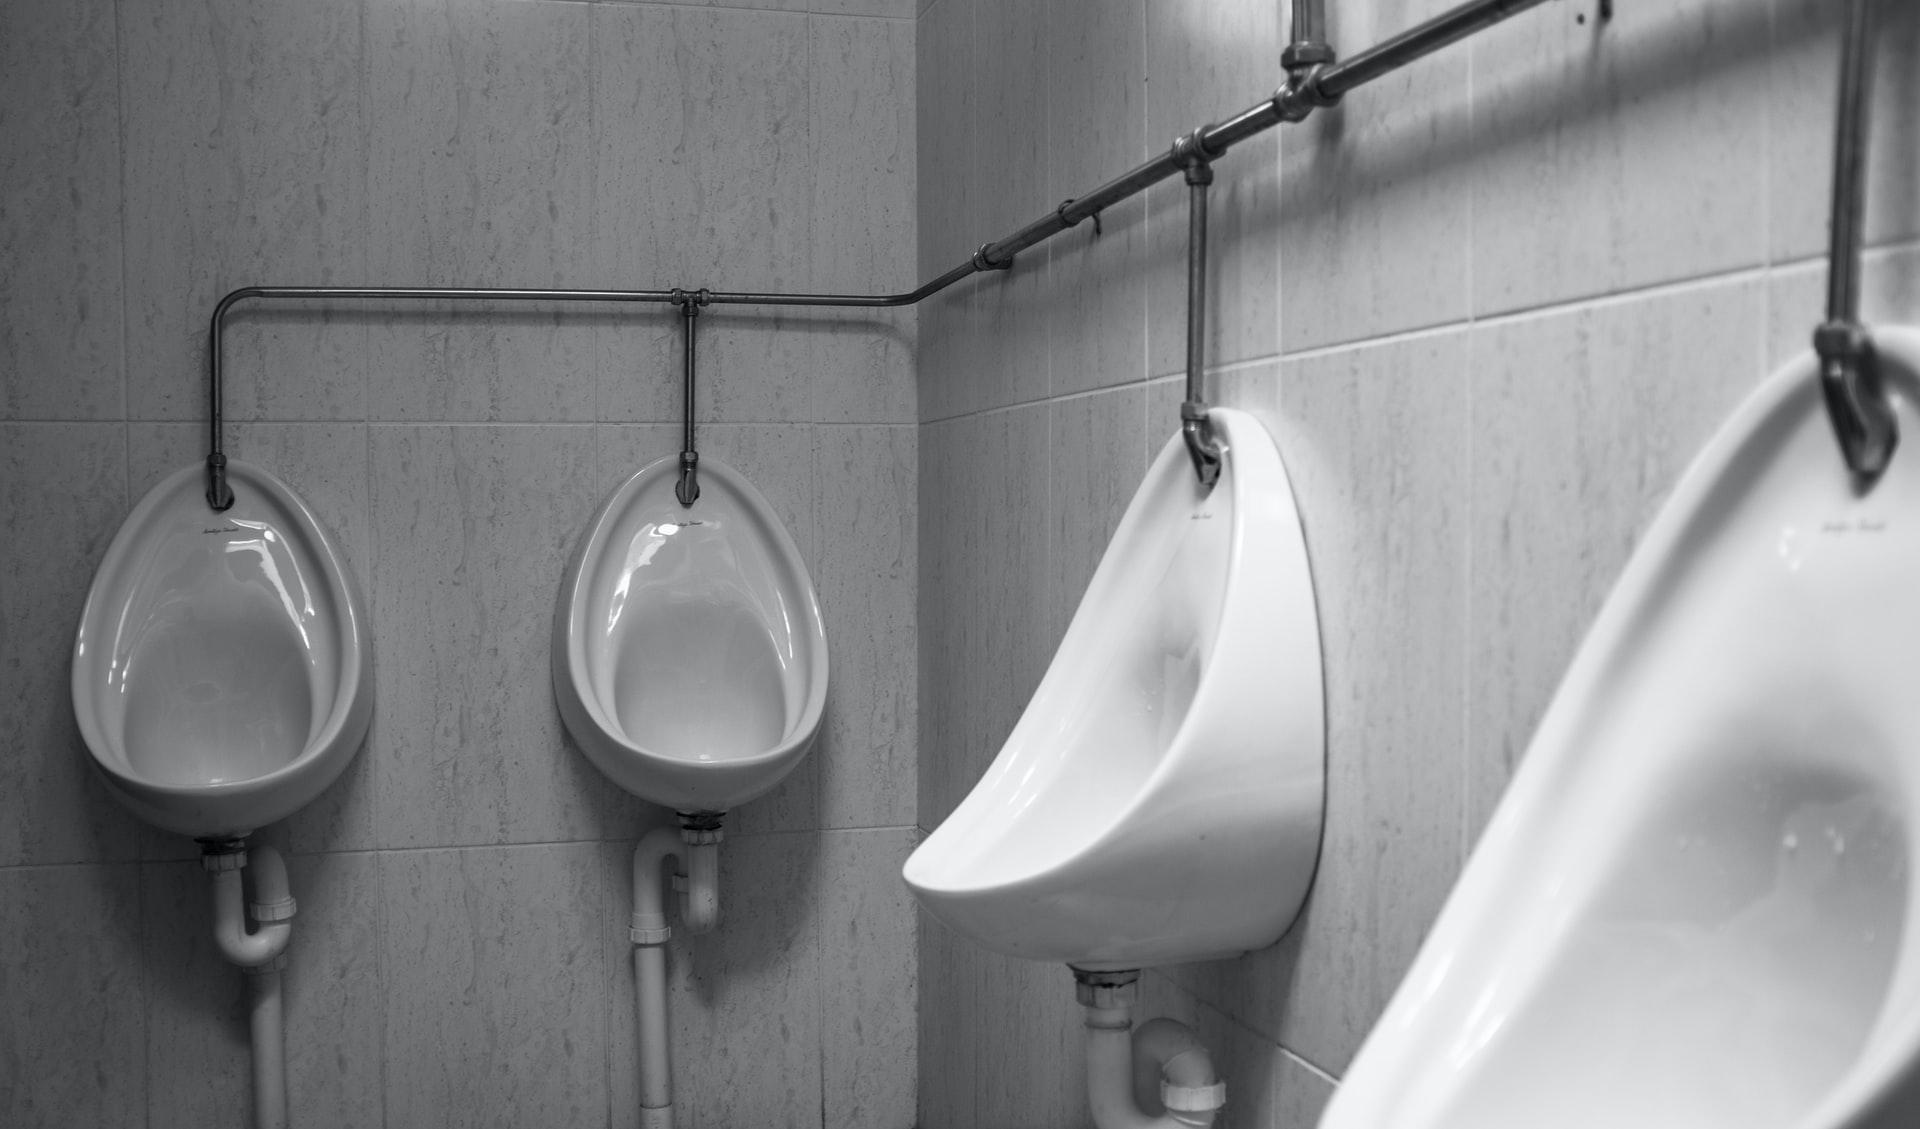 blocked urinal